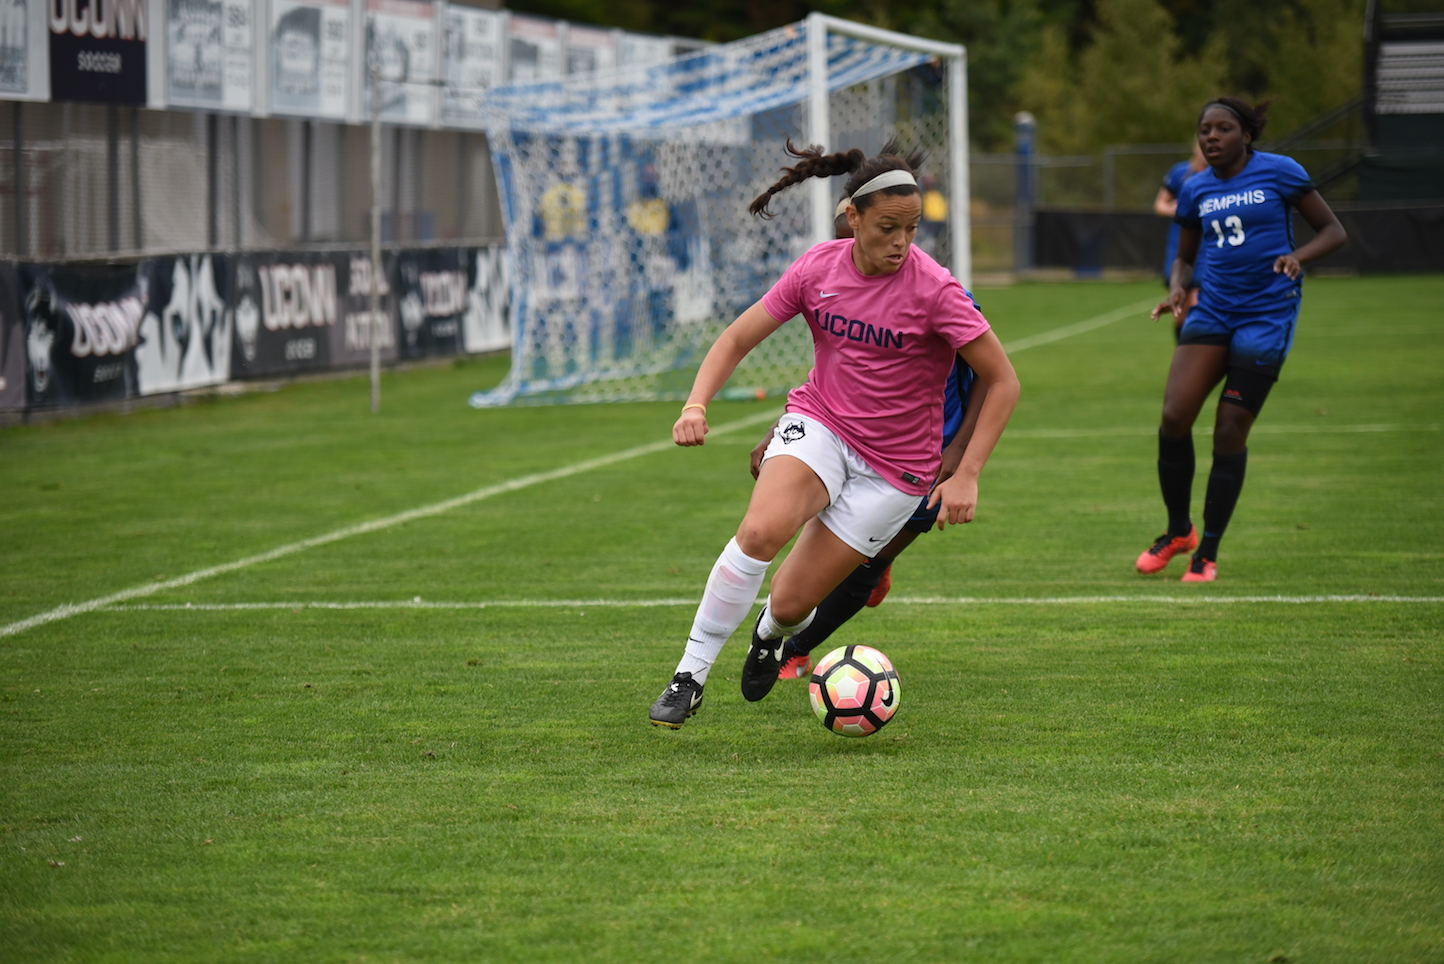 Stephanie Ribeiro (#18) battles for possession in UConn's 4-0 win over Memphis on Oct. 4, 2016 at Joseph J. Morrone Stadium. The Huskies beat Houston 1-0 on Sunday, Oct. 9, 2016.